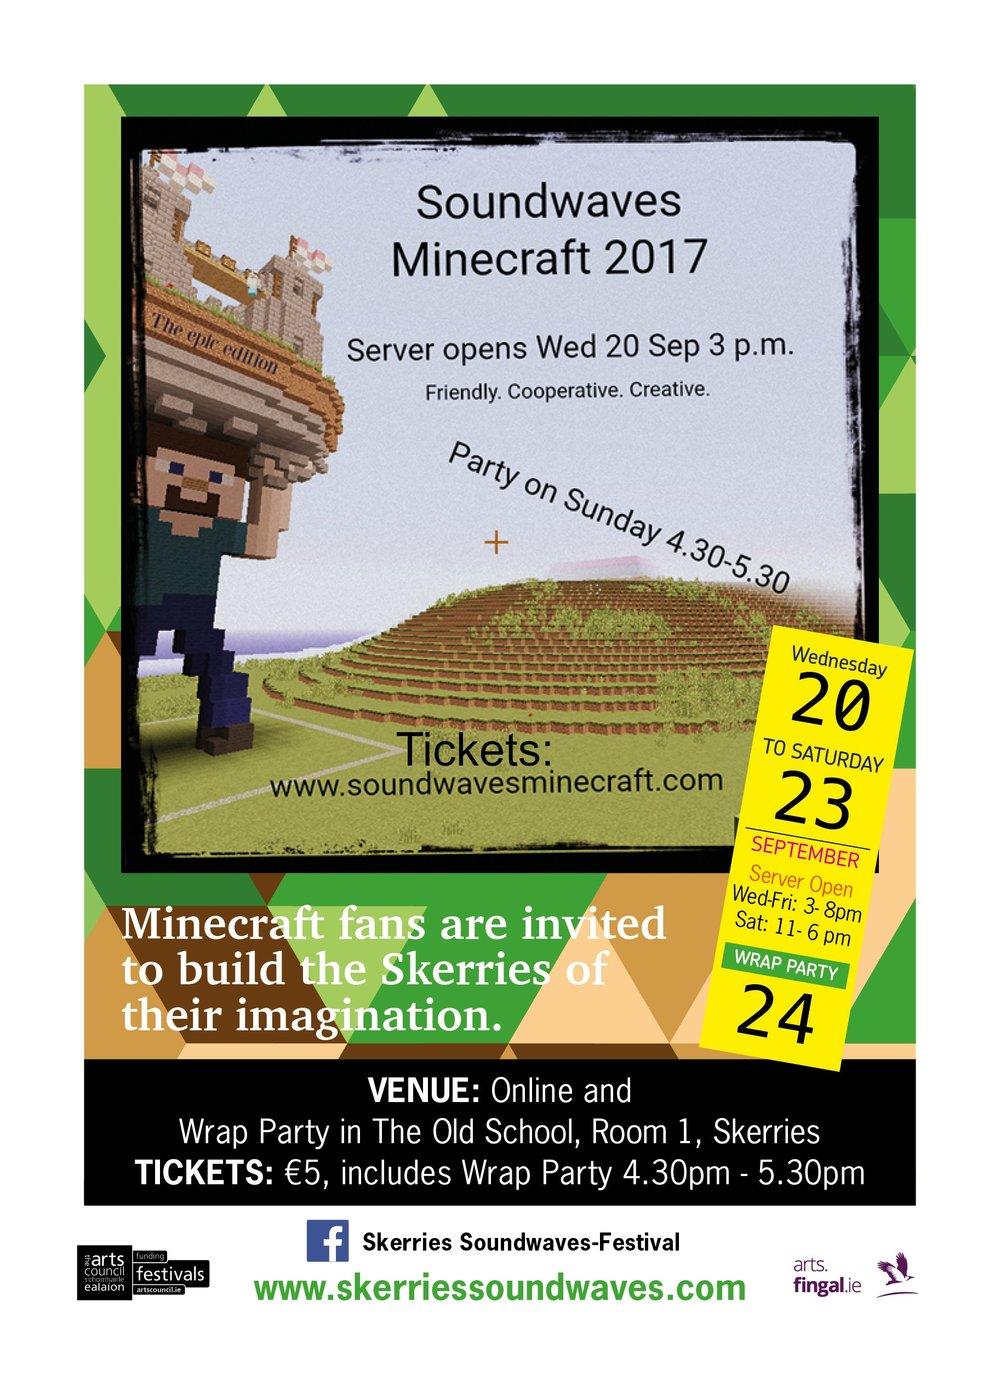 SoundWaves Minecraft 2017 poster